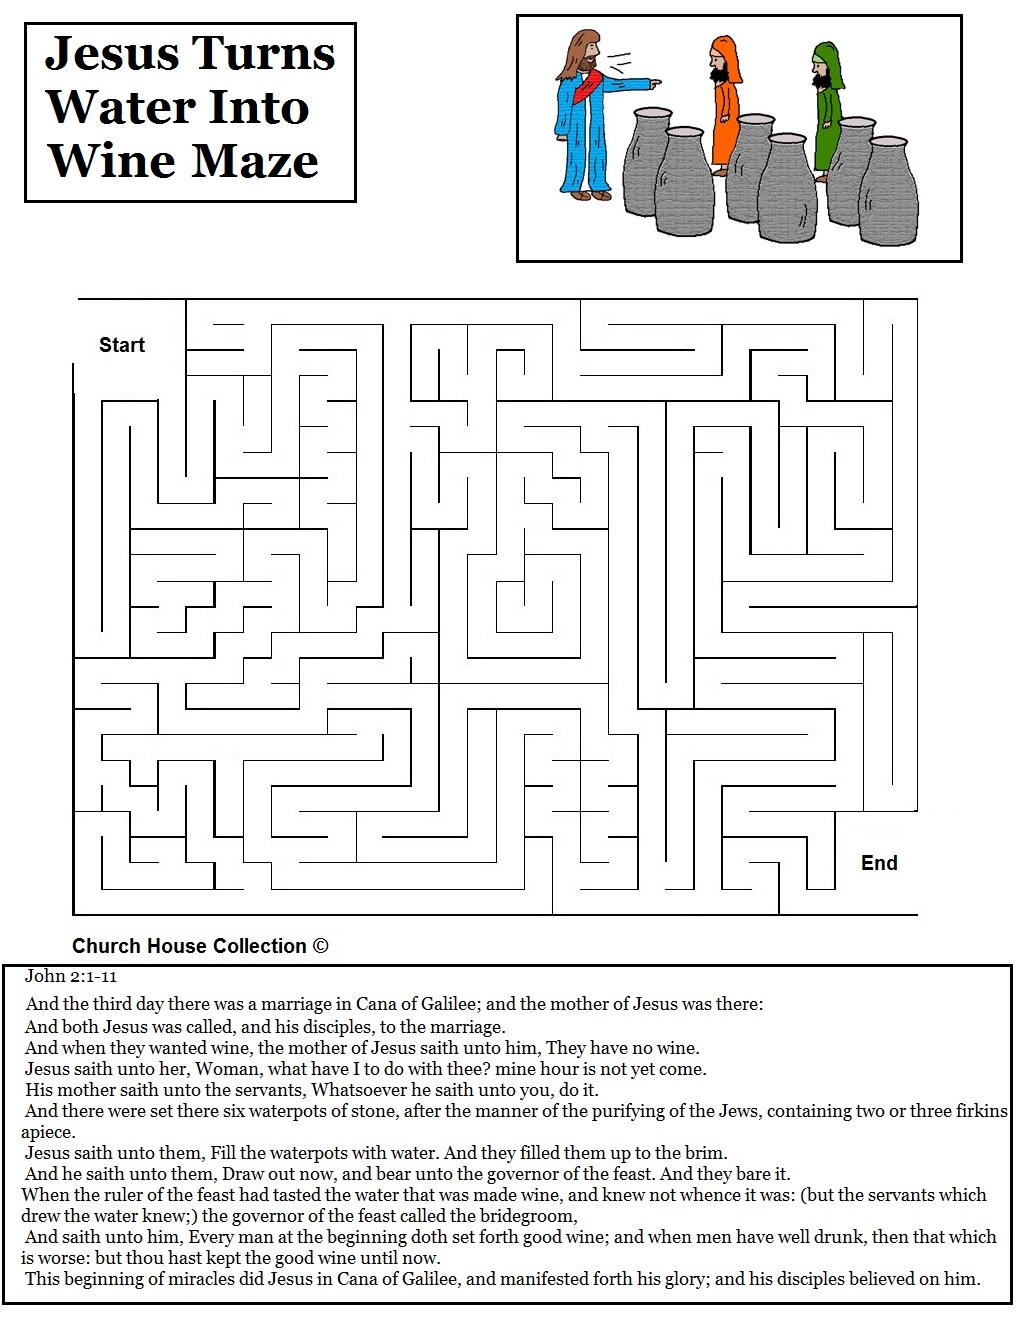 Jesus Turns Water Into Wine Sunday School Lesson